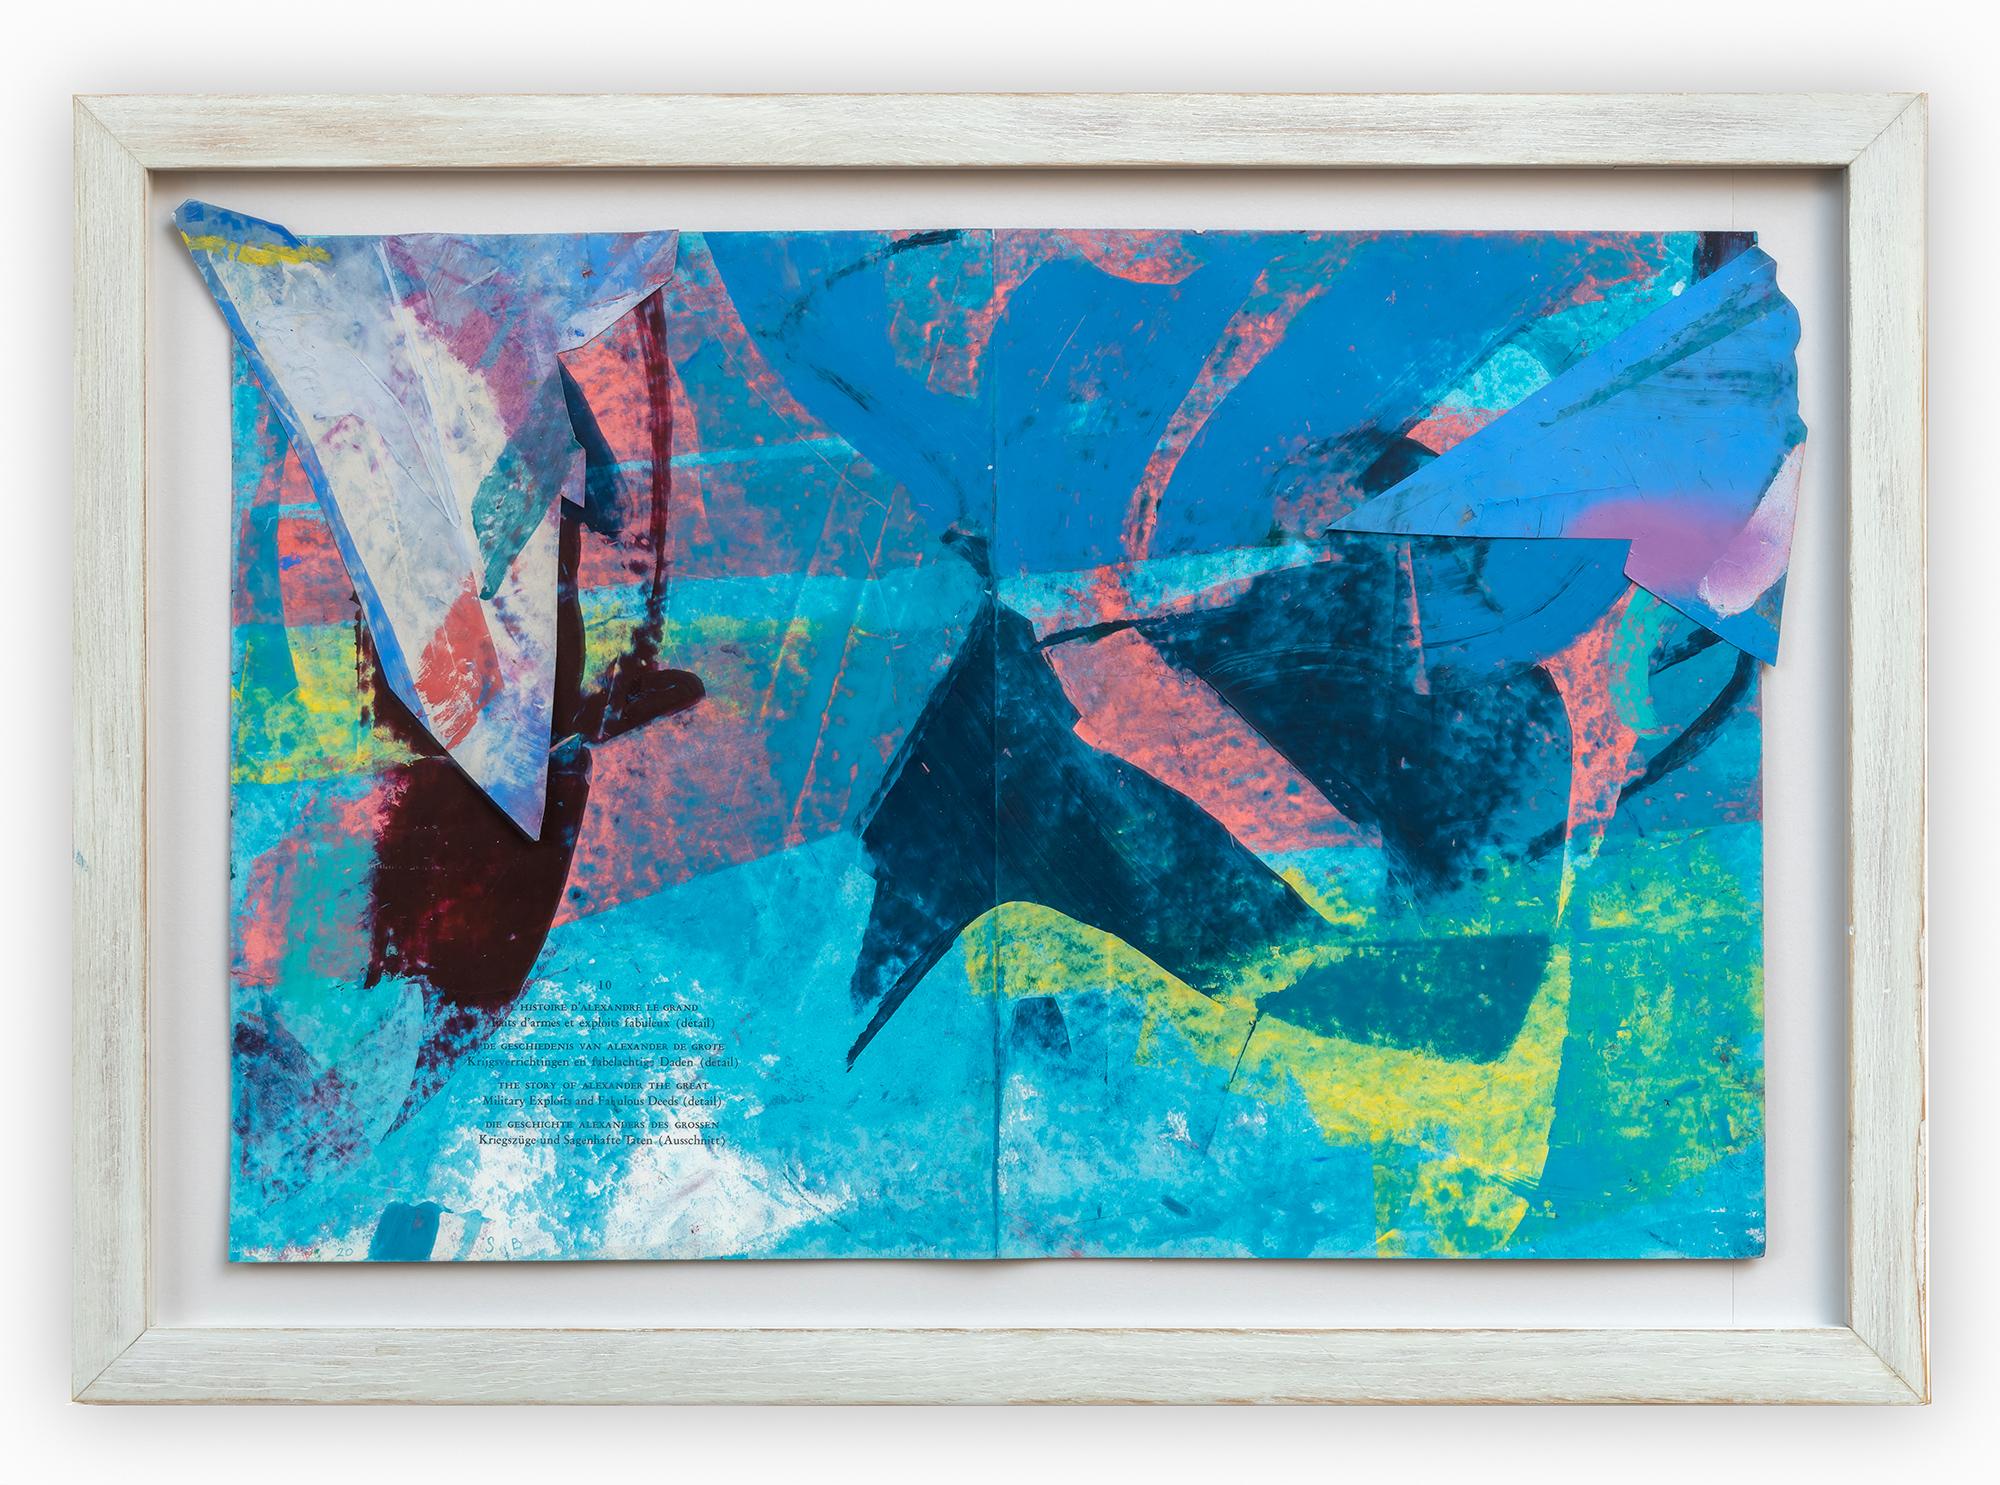 """Histoire d'Alexandre le grand"" 2020 oilpastel on found paper collage 43x60 cm artist frame"